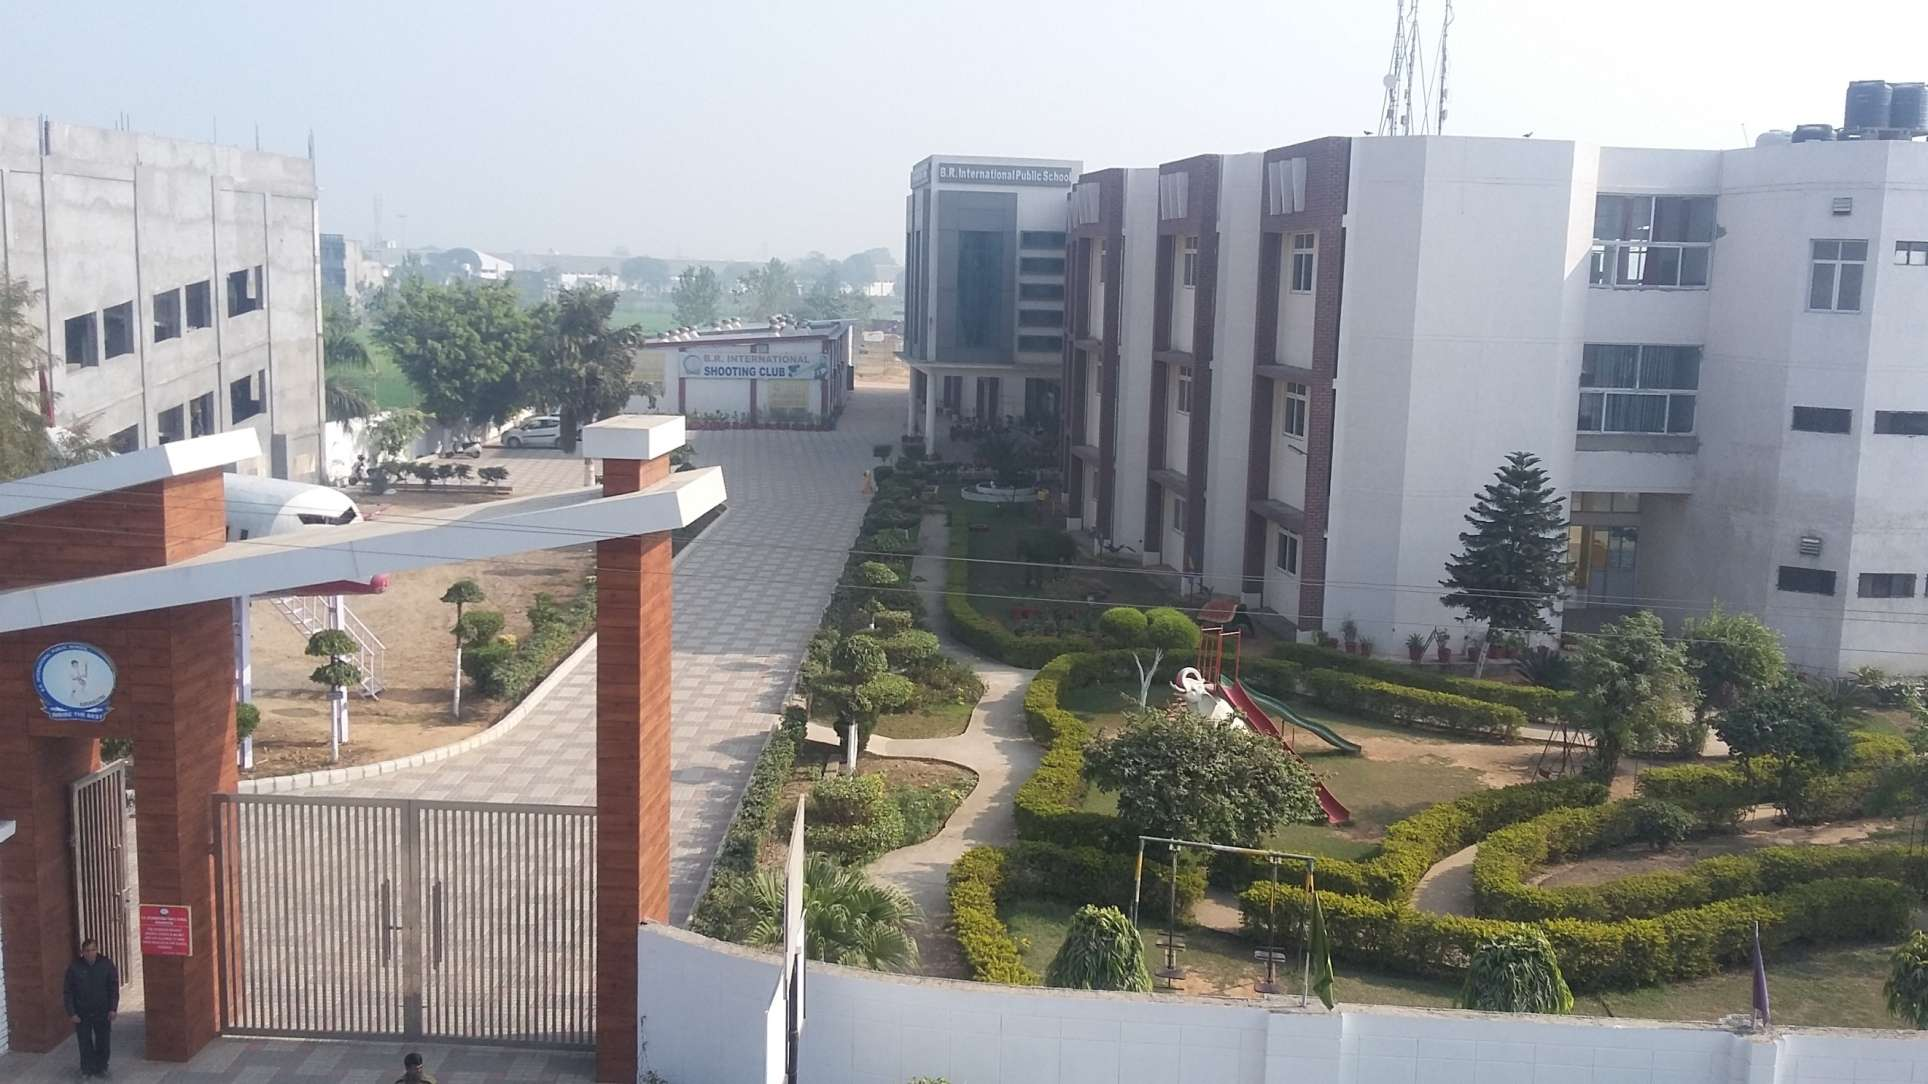 B R INTERNATIONAL PUBLIC SCHOOL NEAR NEW GRAIN MARKET SALAPUR ROAD KURUKSHETRA THANESAR HARYANA 530592